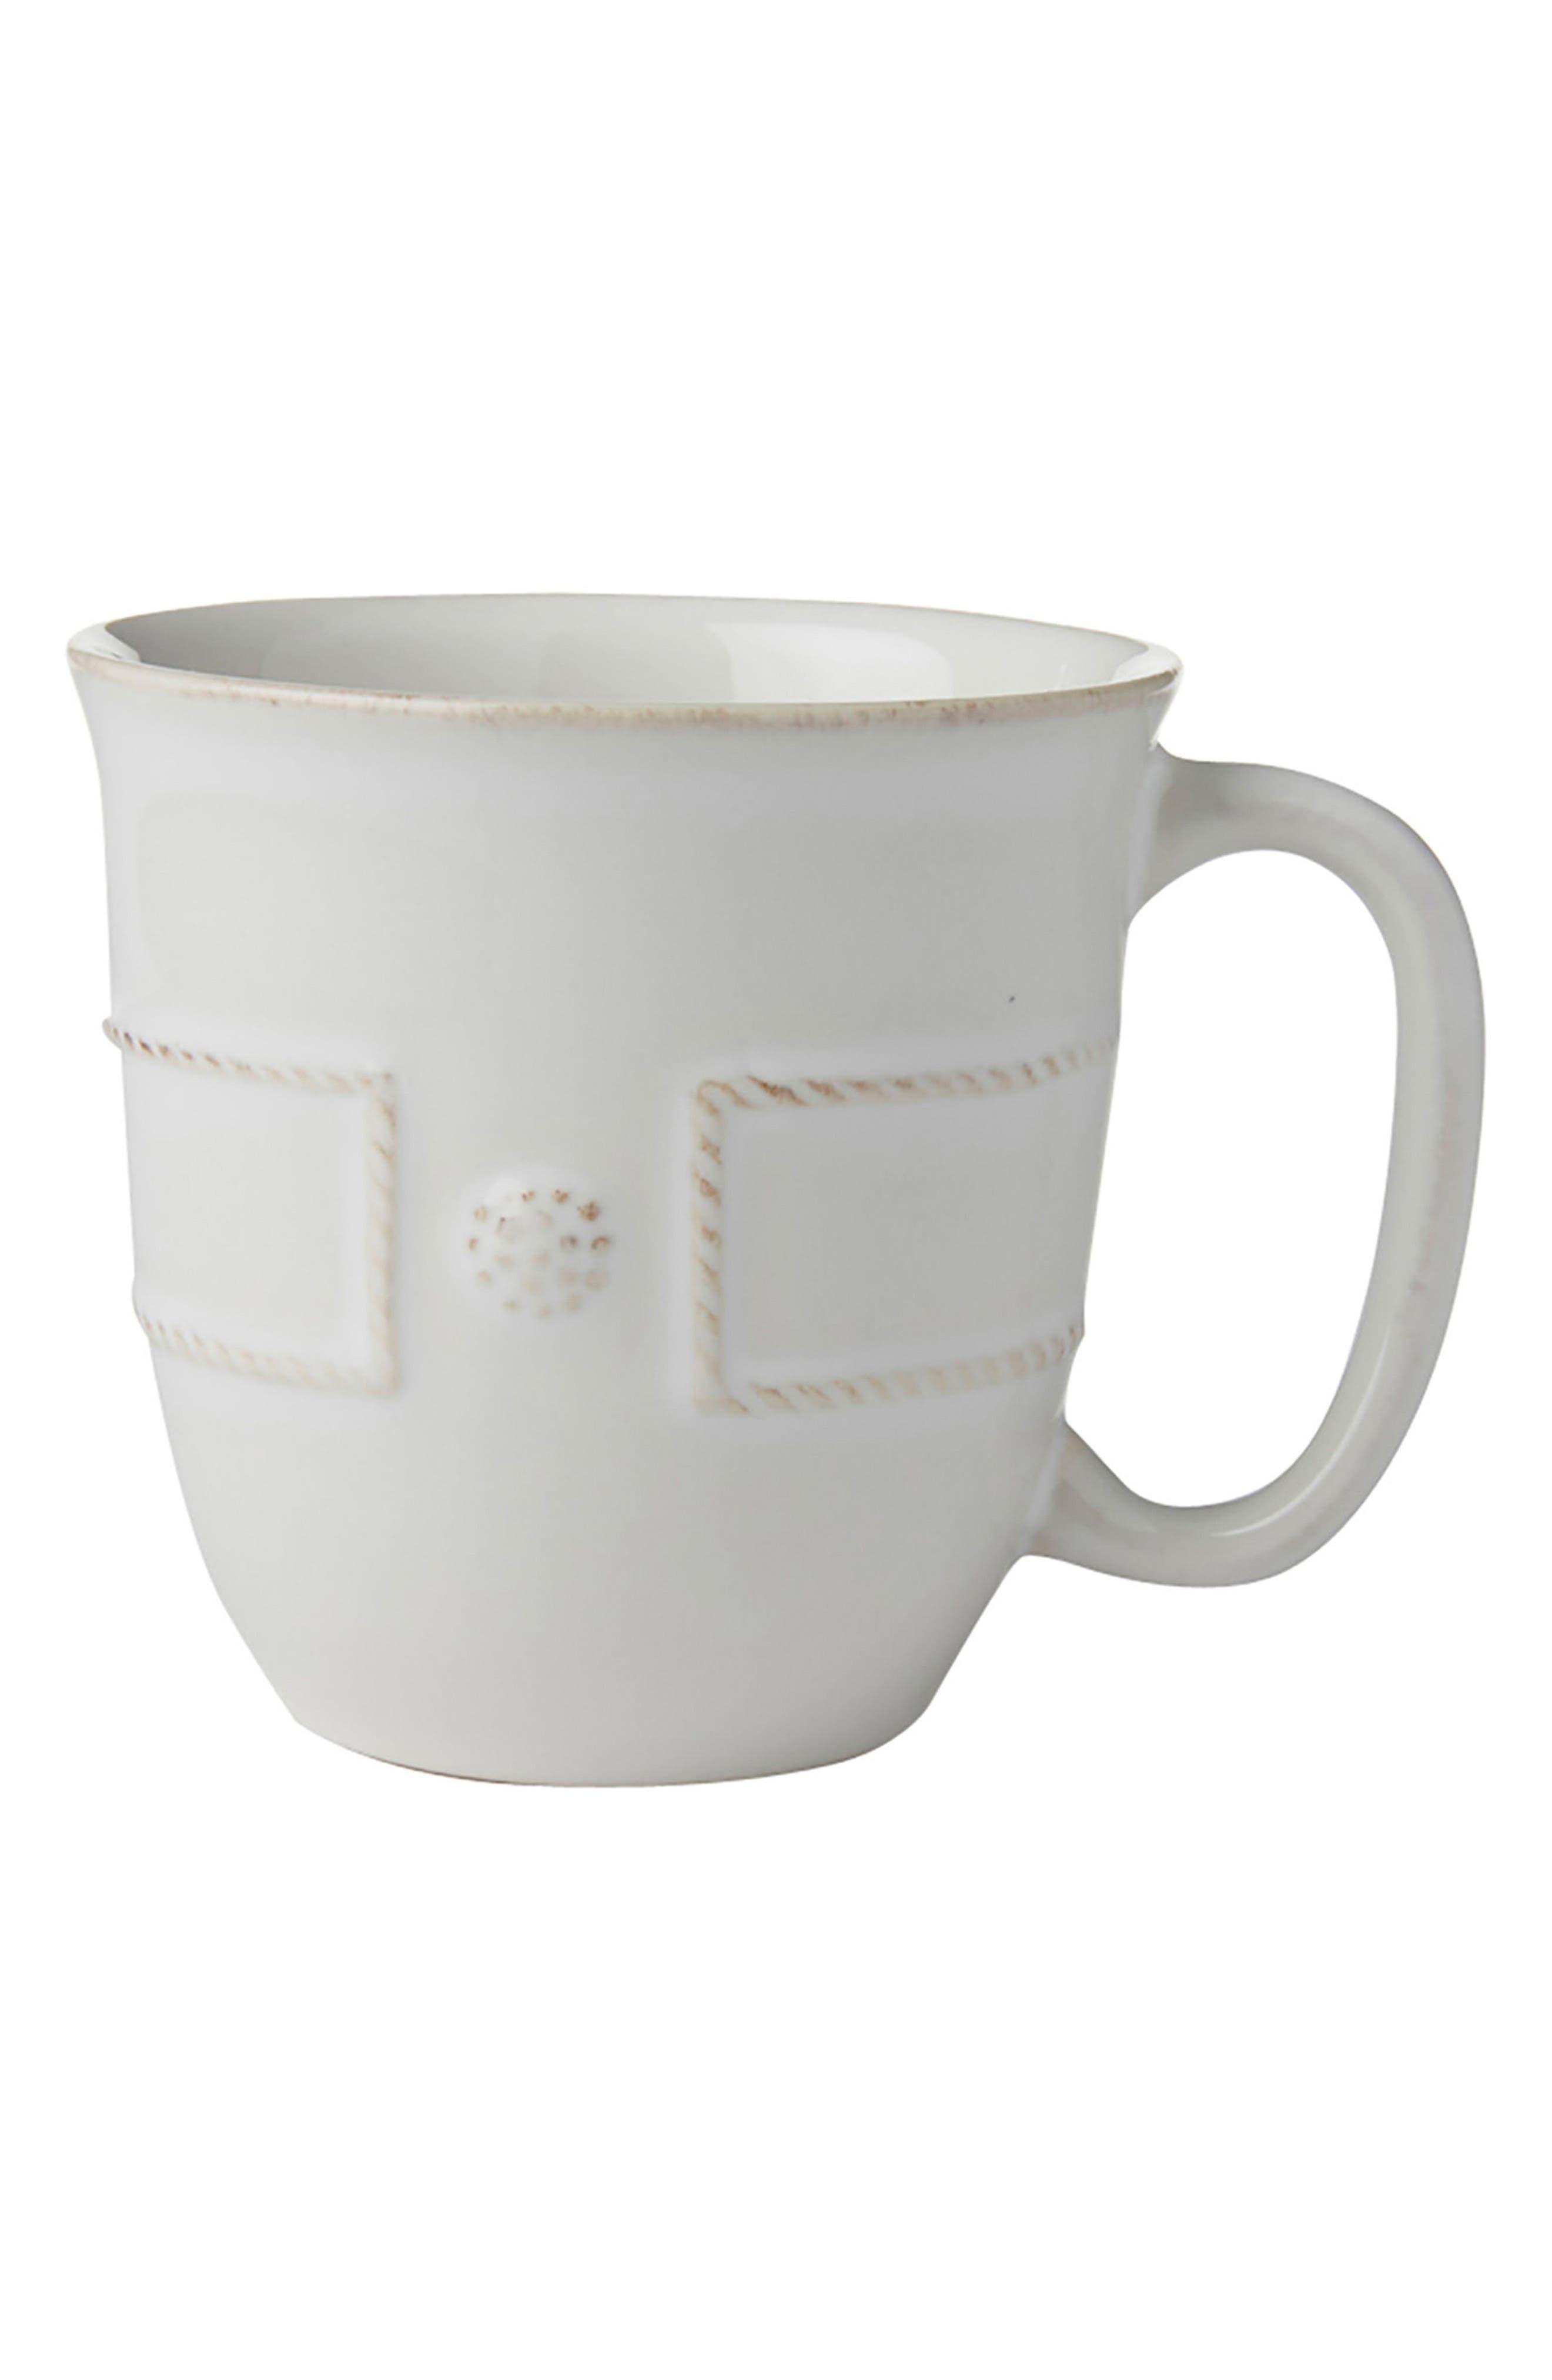 Berry & Thread Ceramic Cup,                         Main,                         color, Whitewash